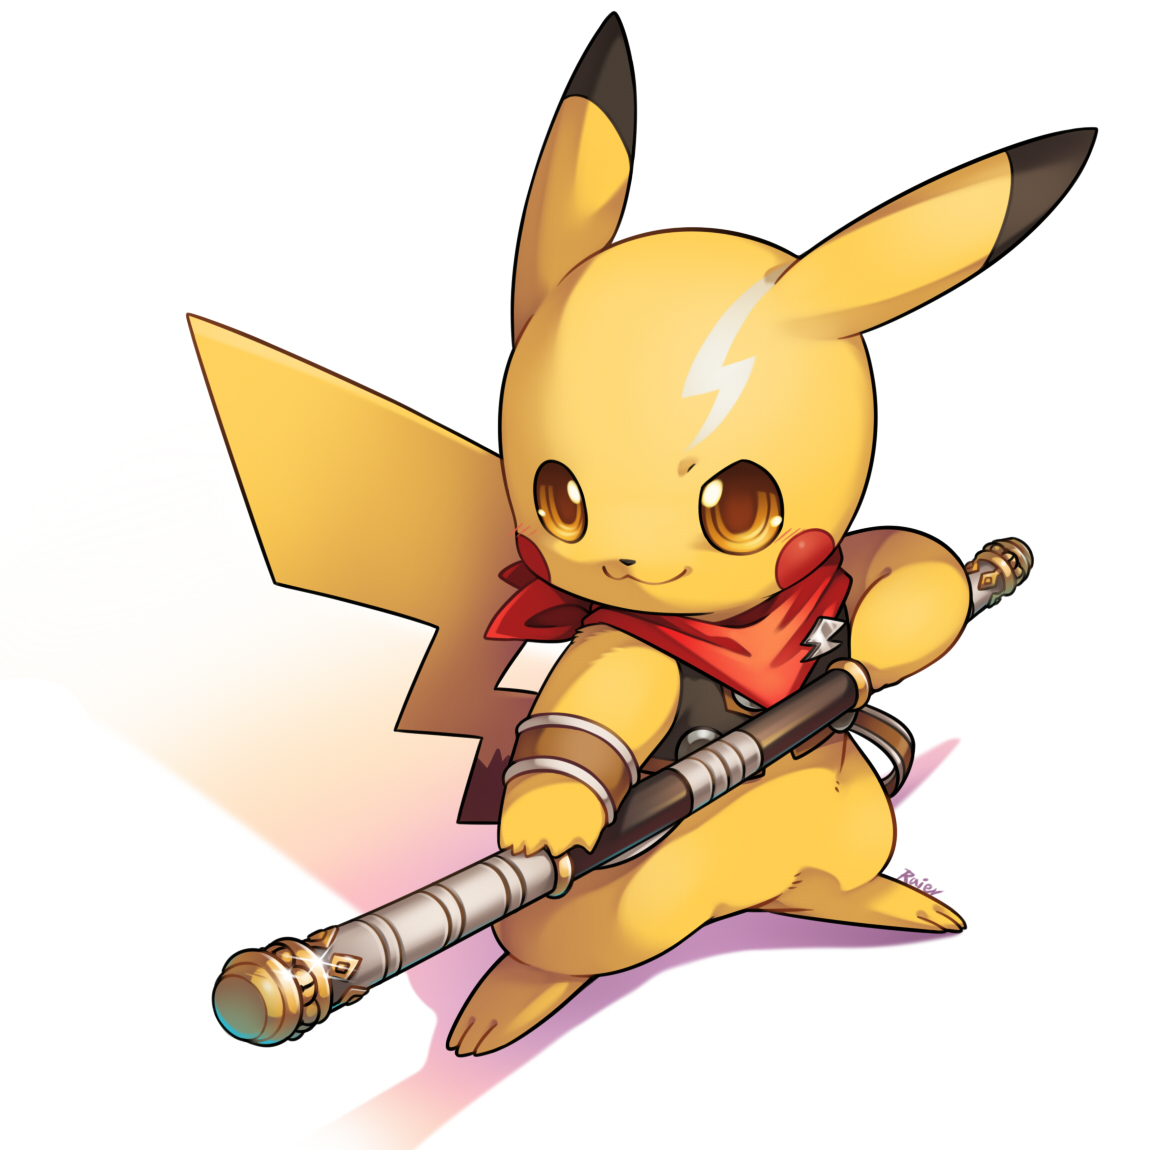 Pikachu.full.1937136.jpg